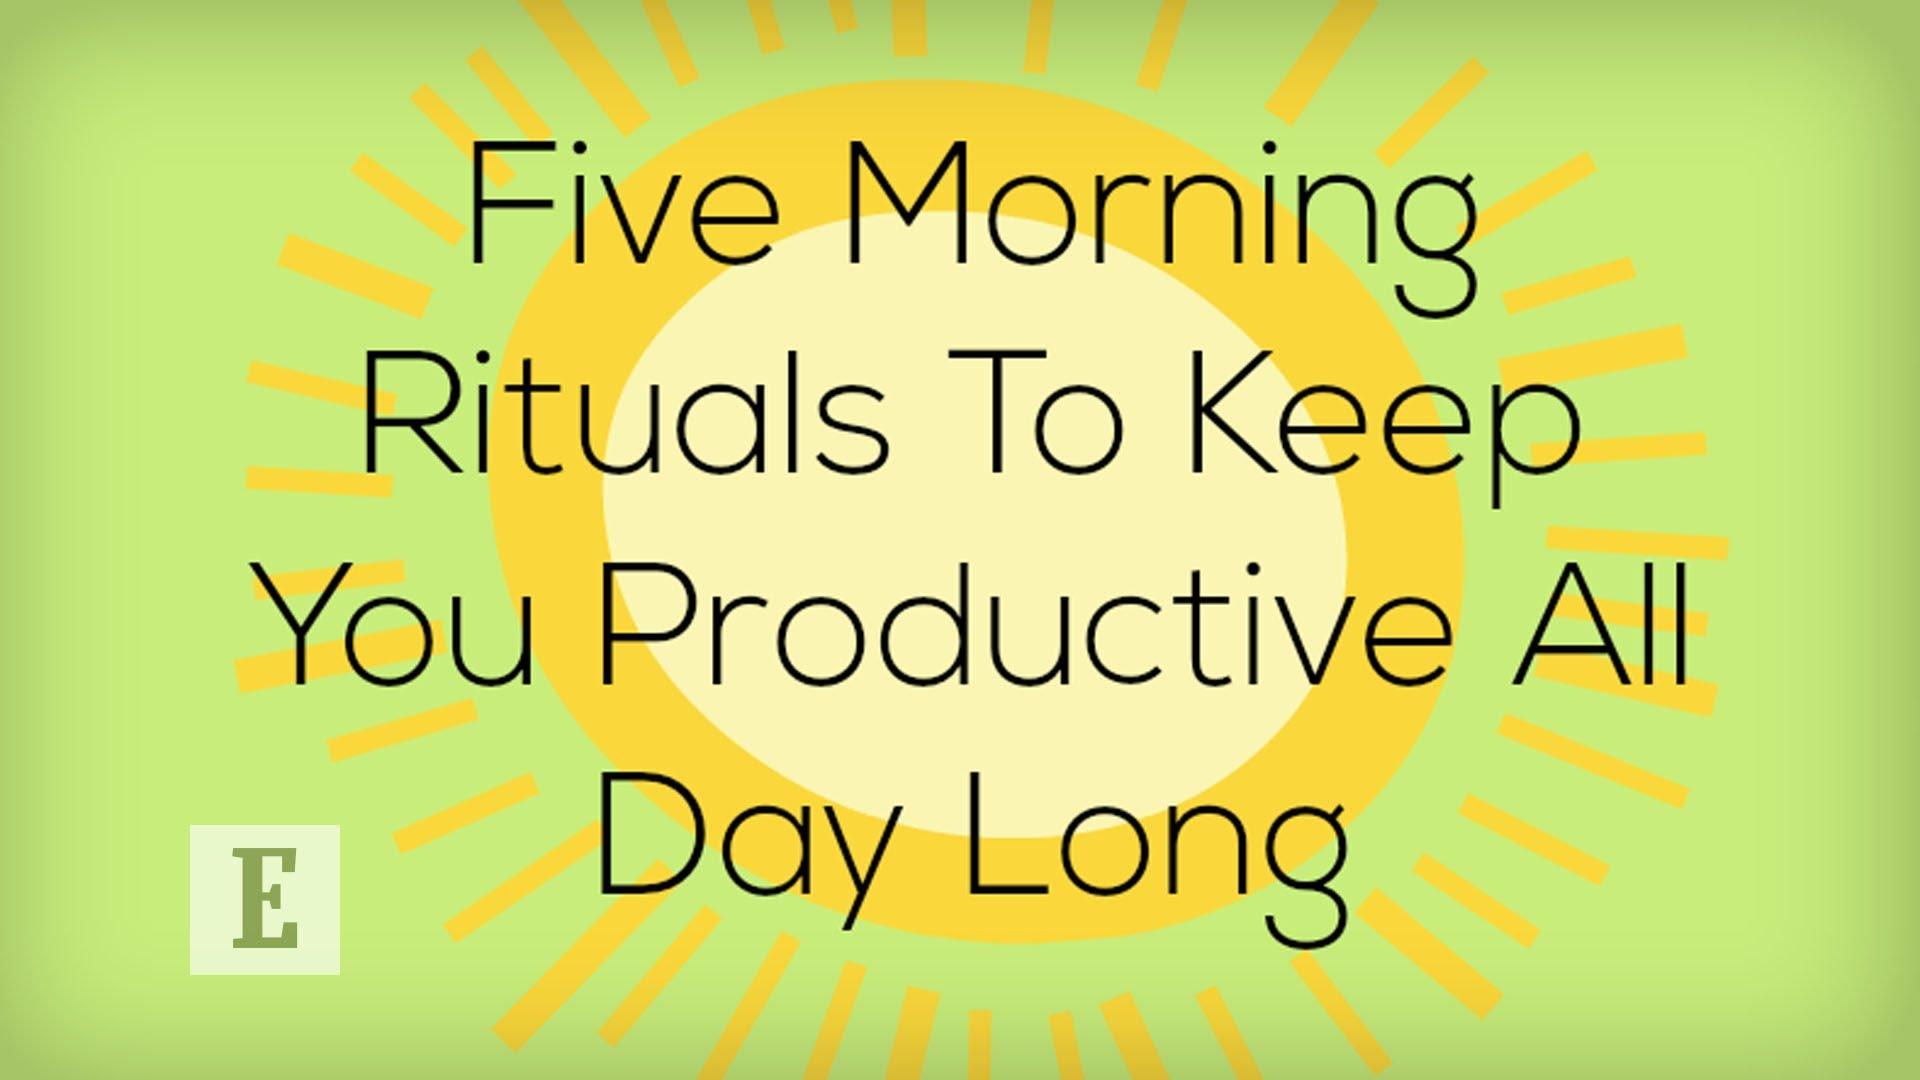 「快跟著做!五件讓你邁向成功的早晨小事」- 5 Morning Rituals to Keep You Productive All Day Long